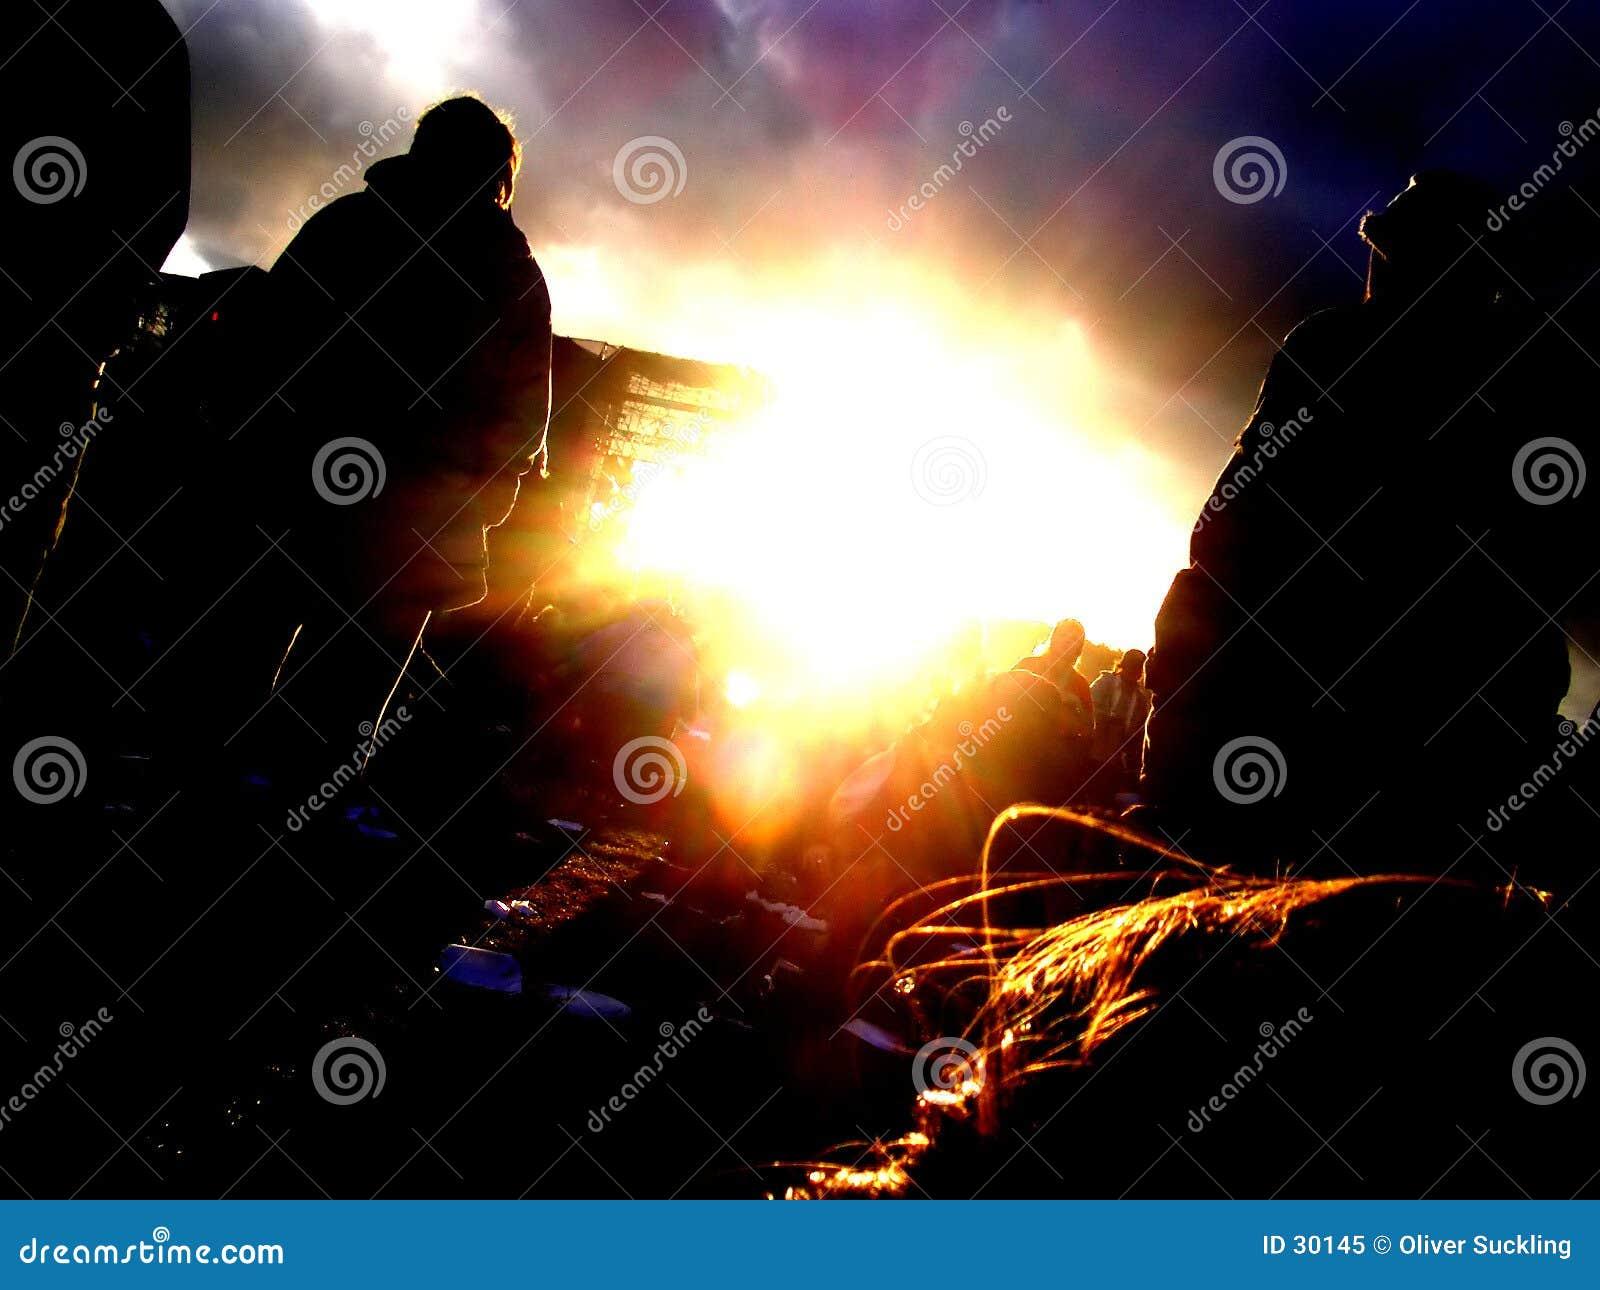 Download Awaiting sunset stock image. Image of eventide, nightfall - 30145